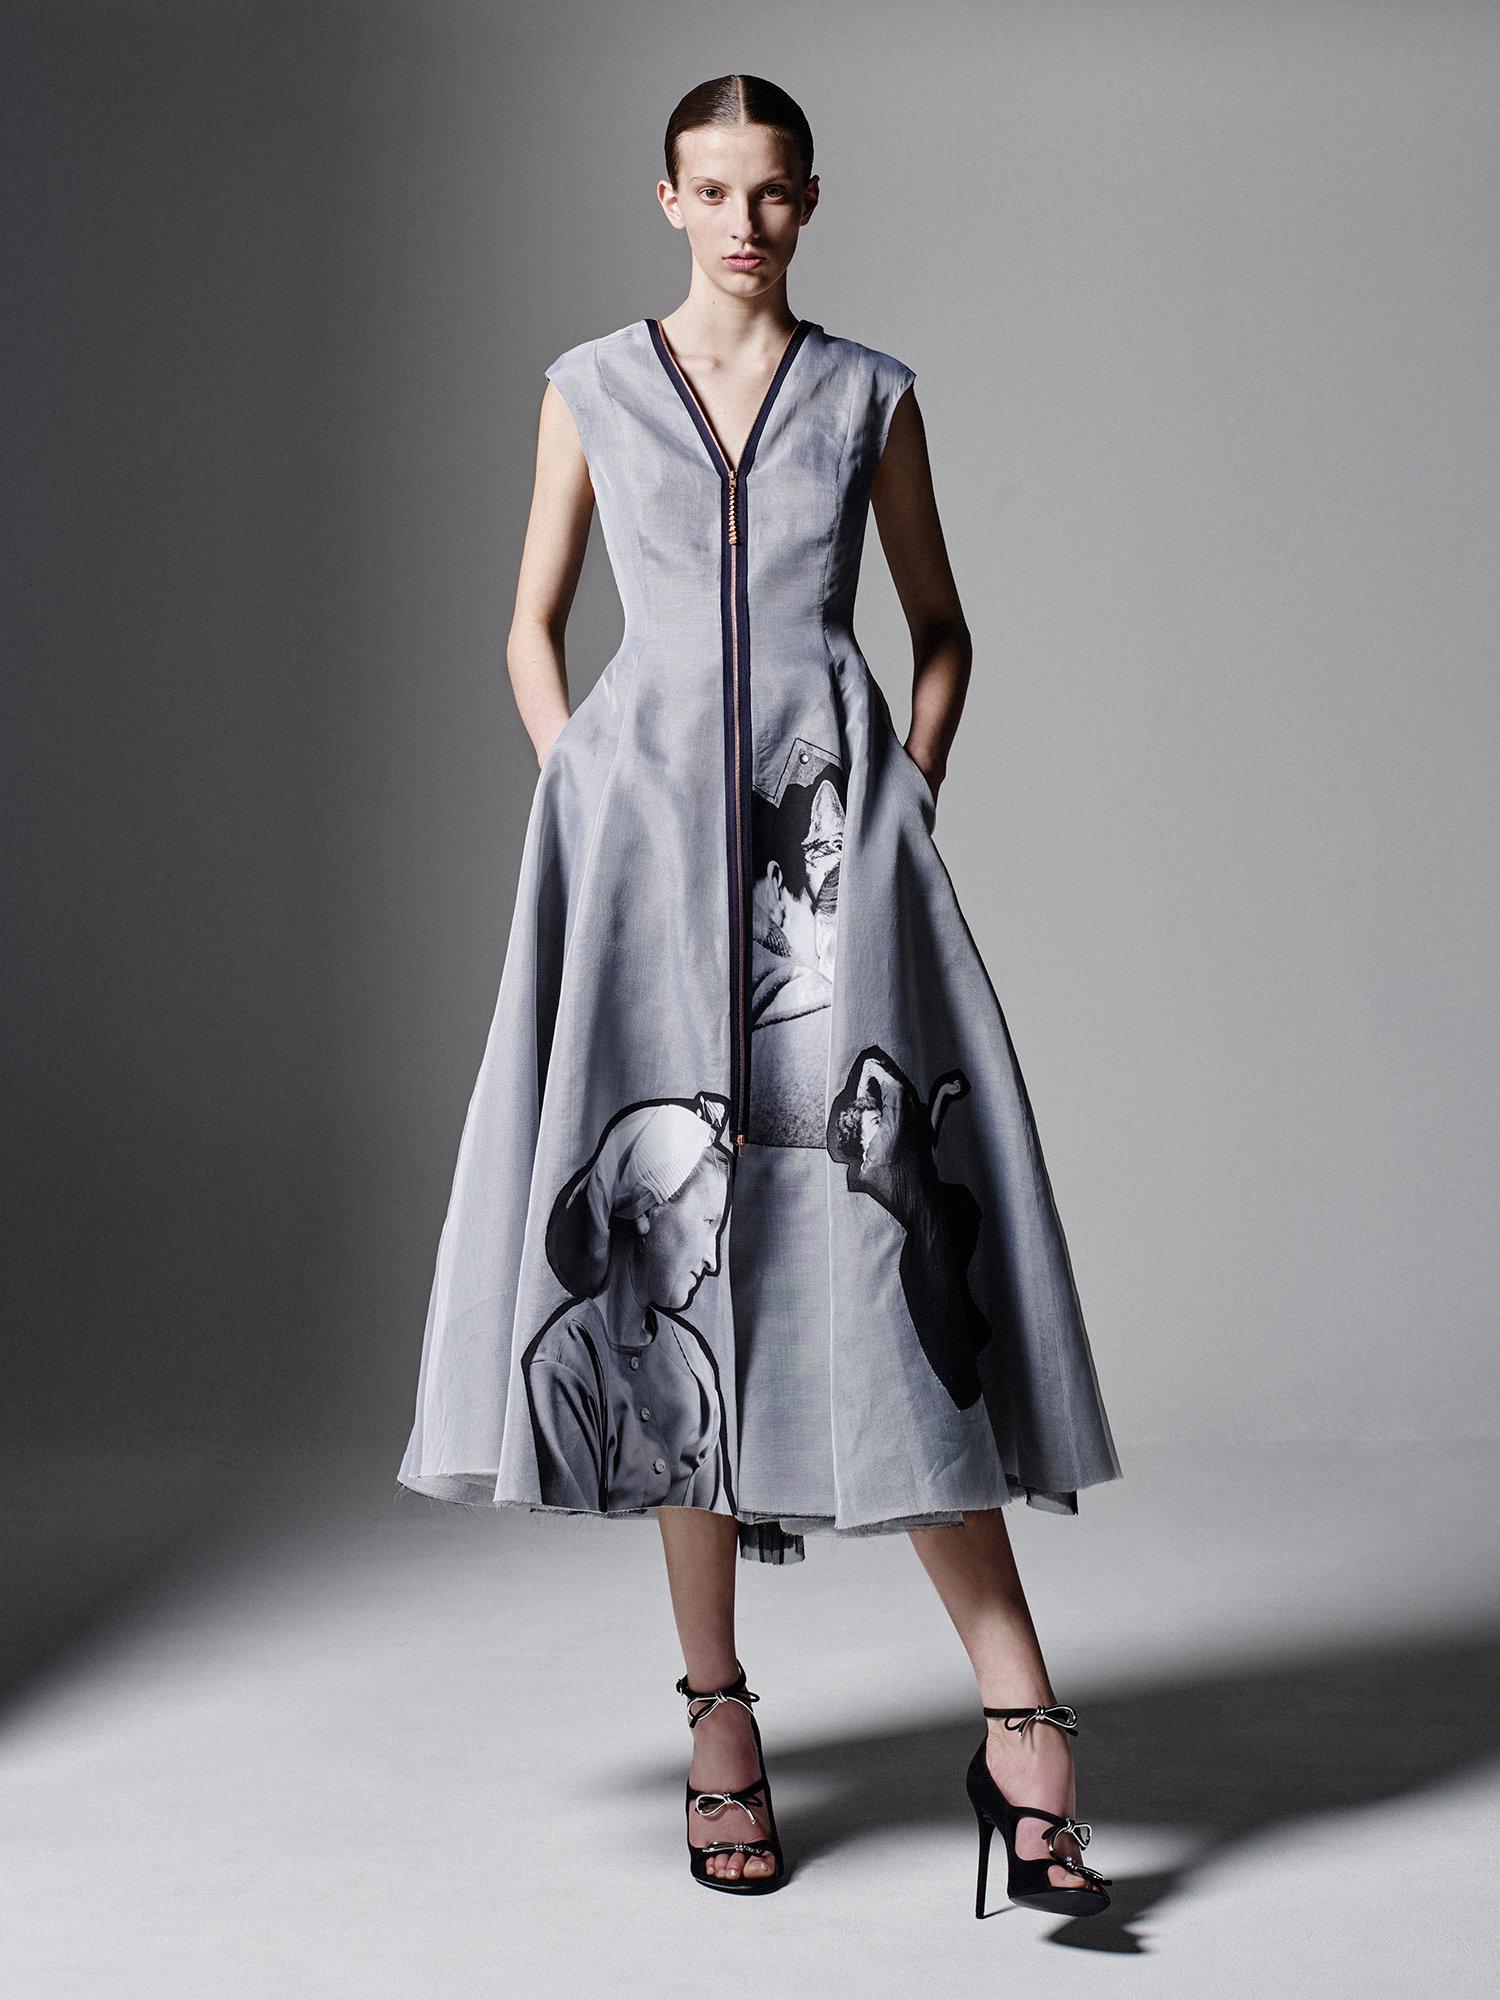 LOOKBOOK Mattijs van Bergen Photo to Fashion